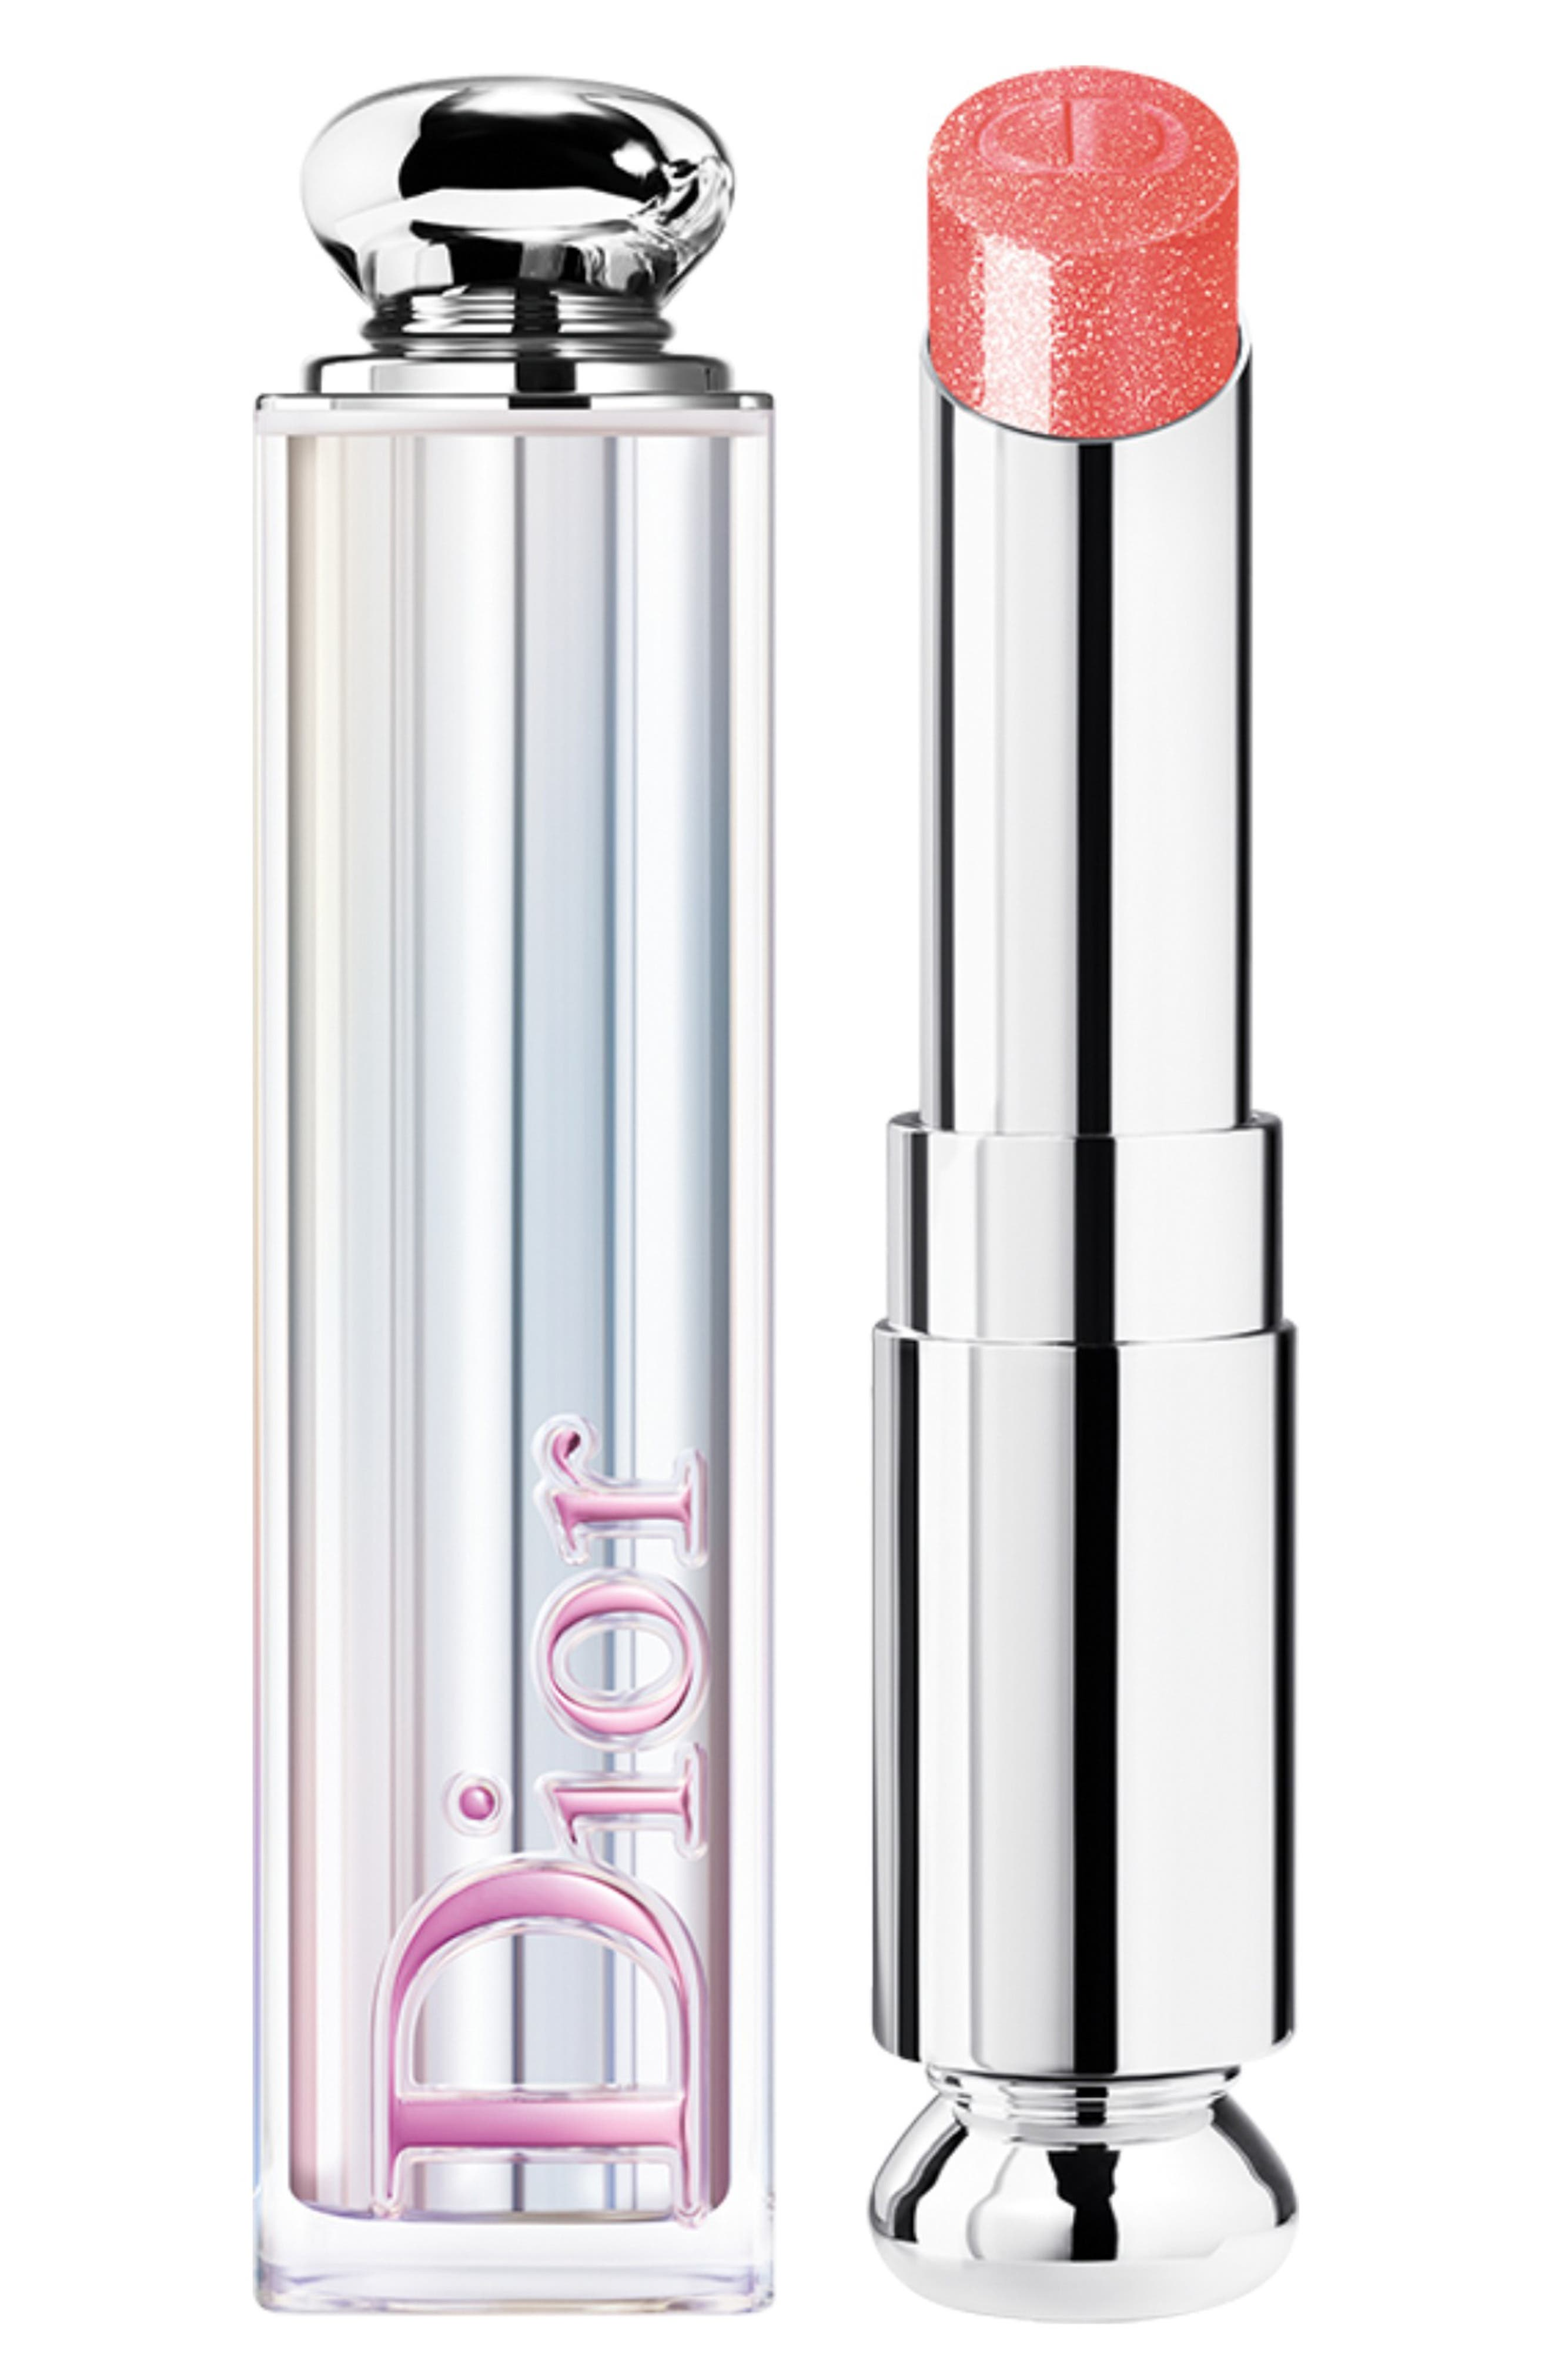 Dior Addict Stellar Shine Lipstick - 352 D-Galaxy